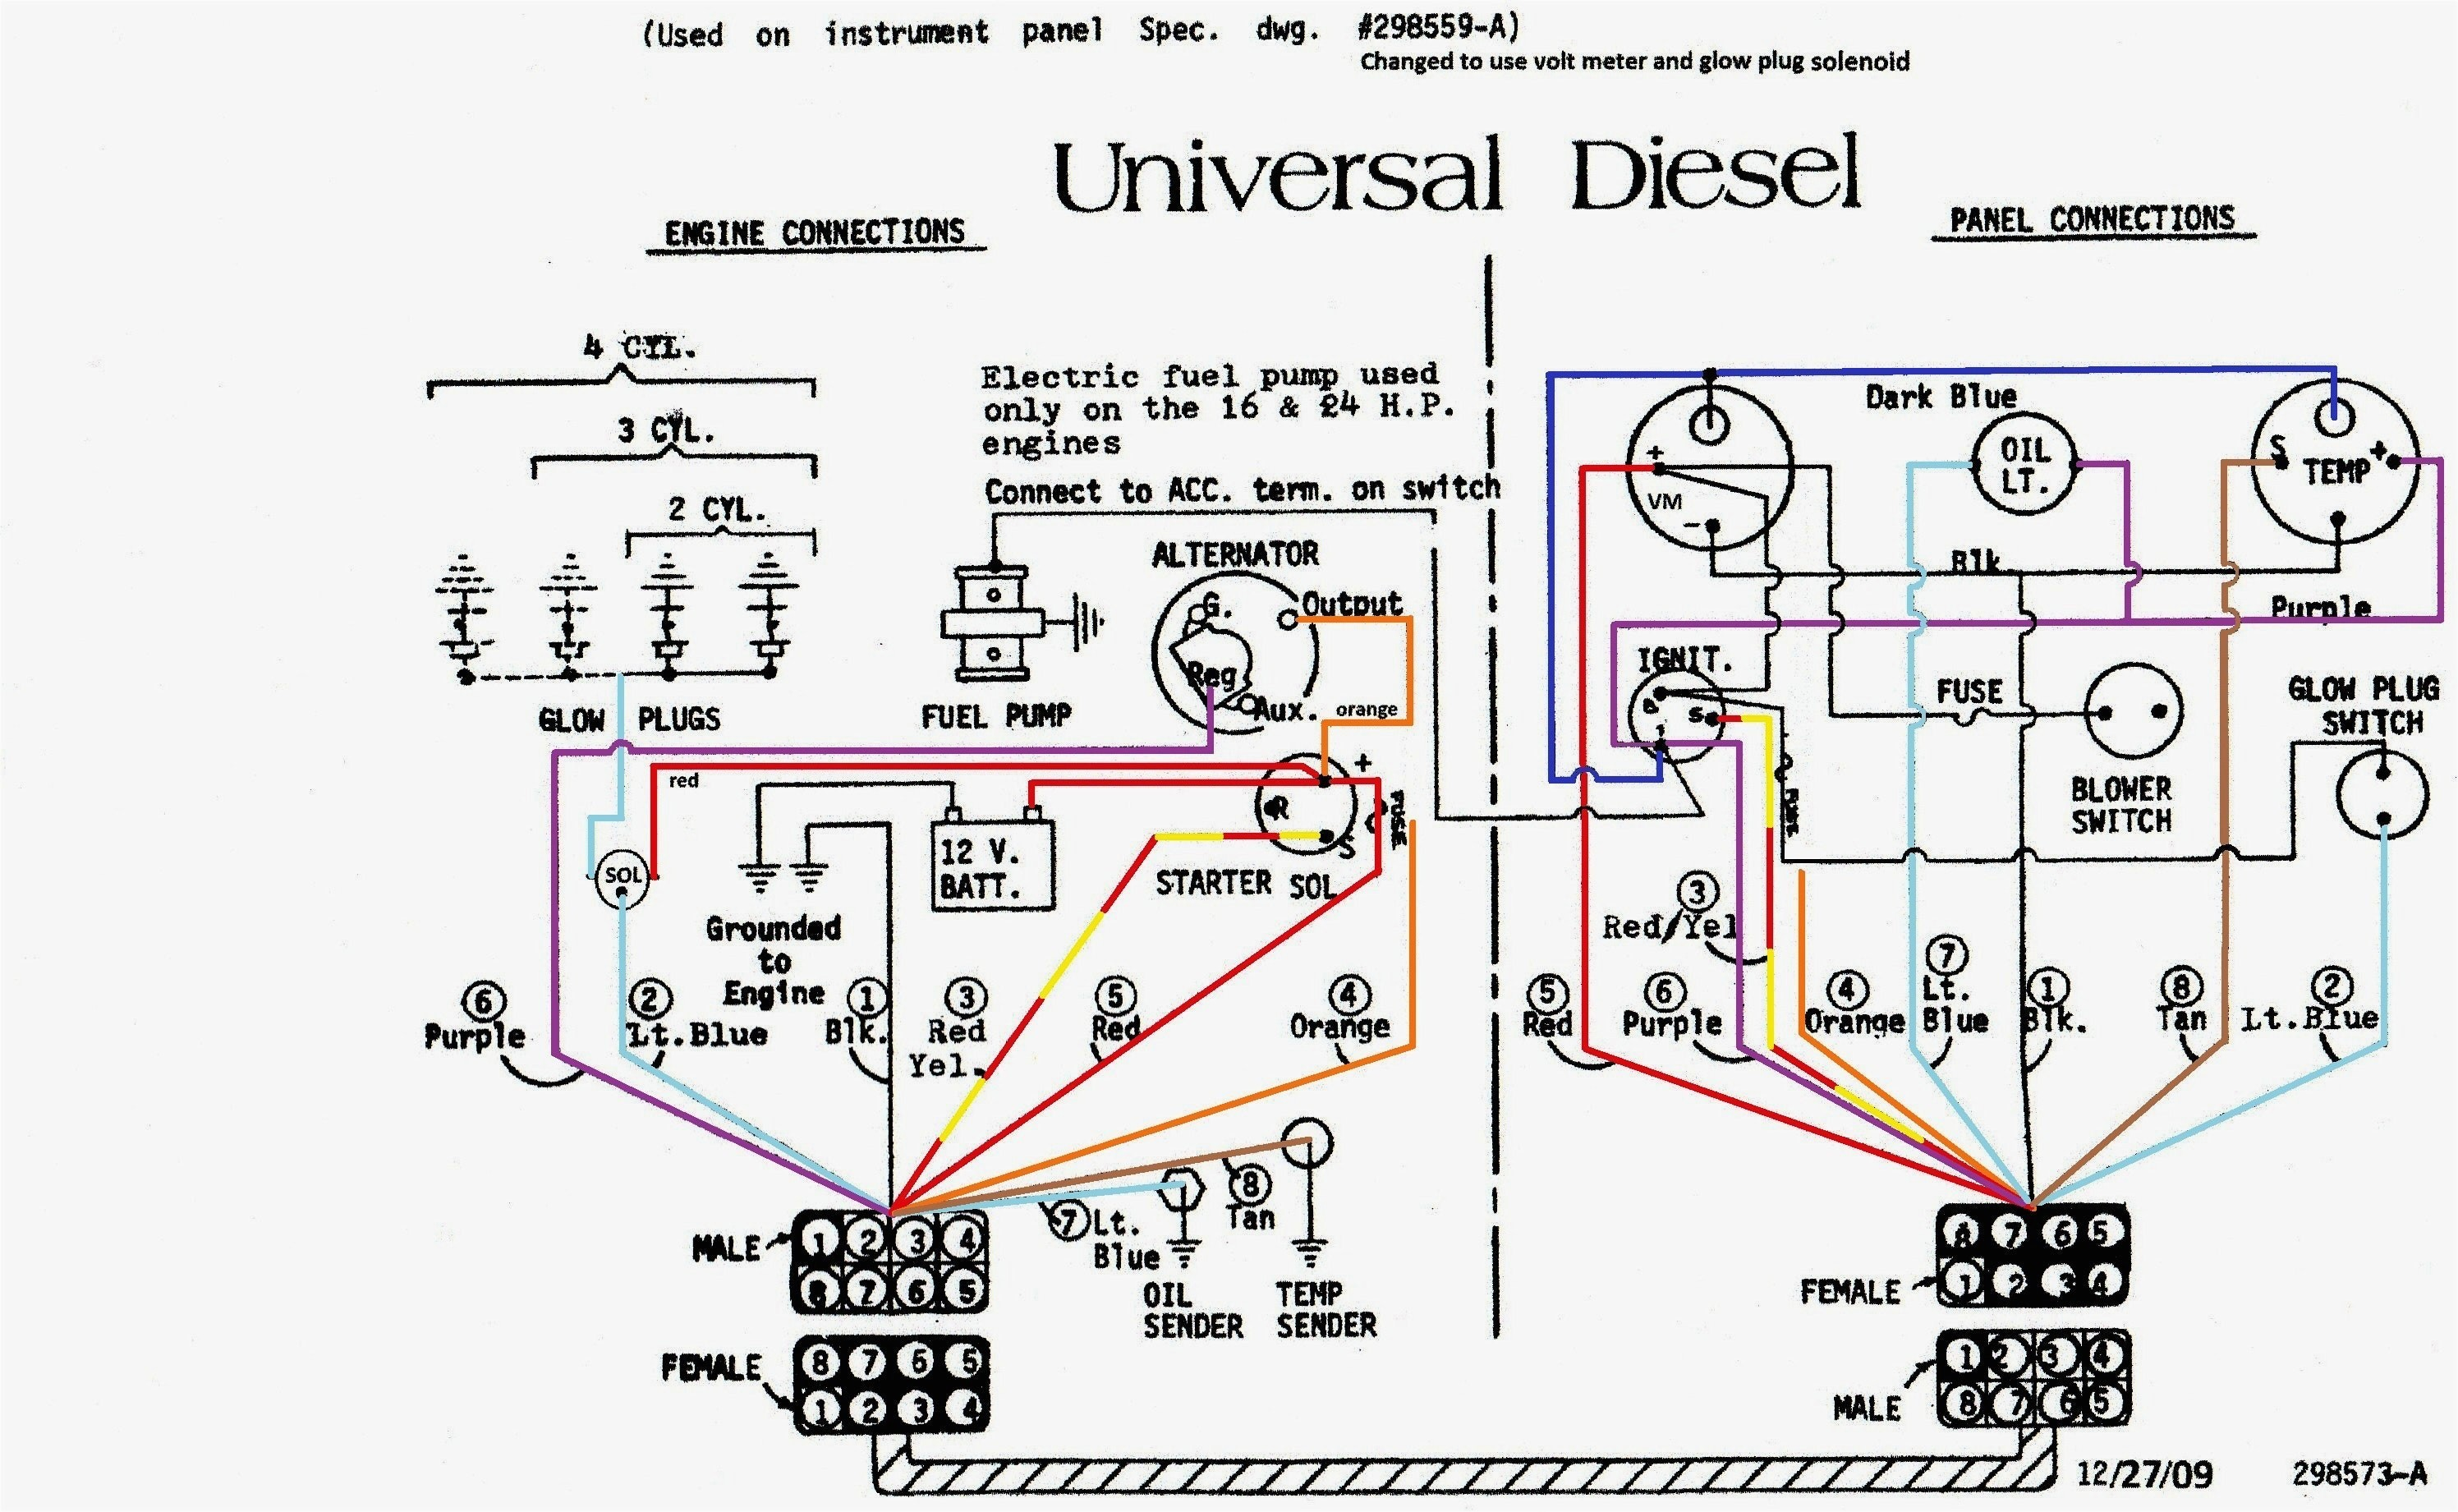 Boat Trailer Lights Wiring Diagram Wiring Diagram for Snowmobile Trailer New Wiring Diagram for Of Boat Trailer Lights Wiring Diagram